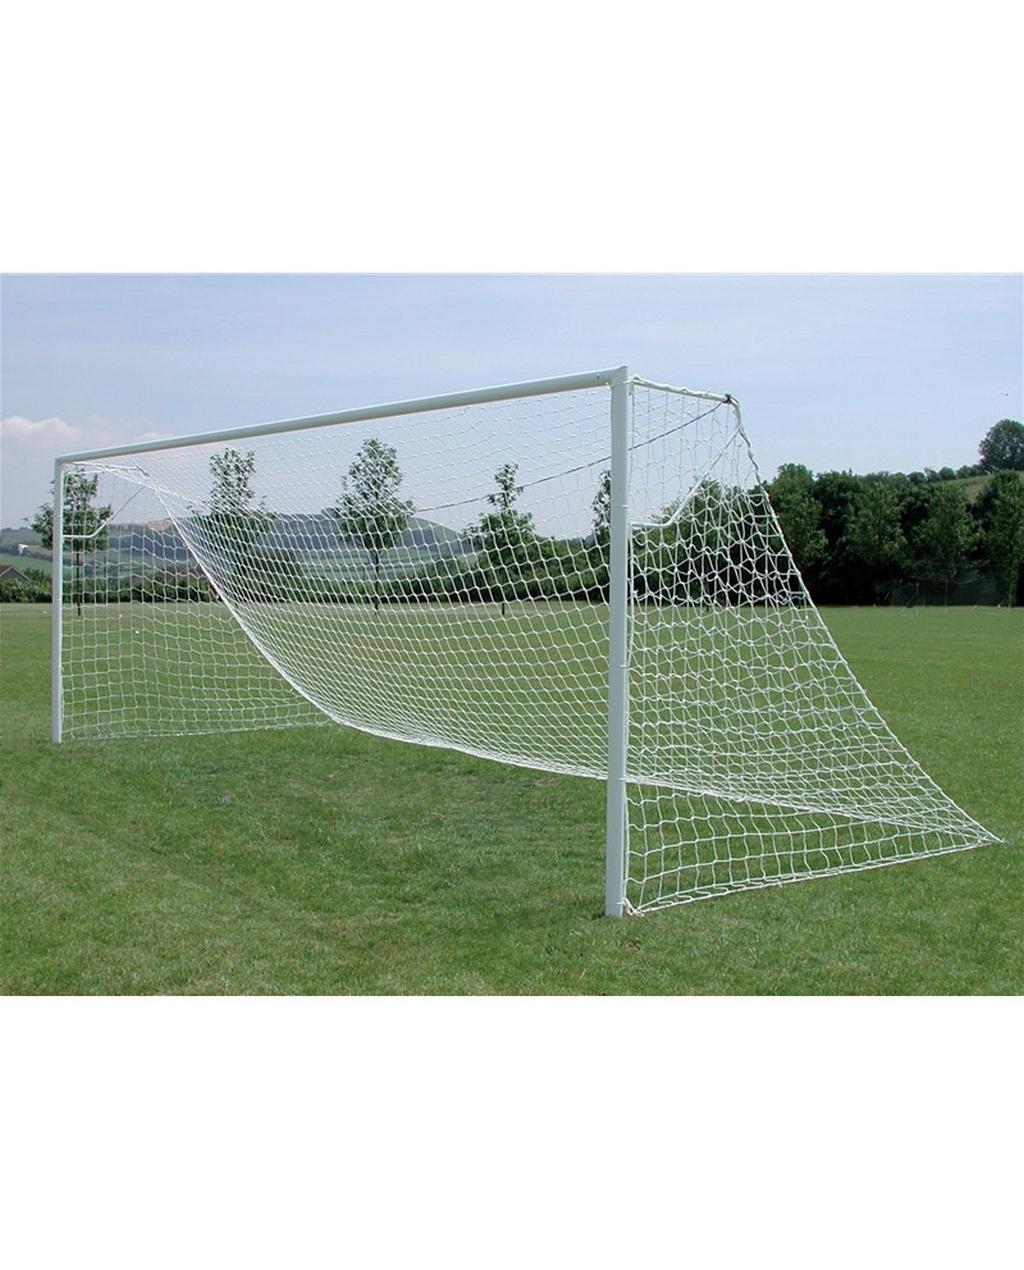 Football Goal Nets 7.3 x 2.4m